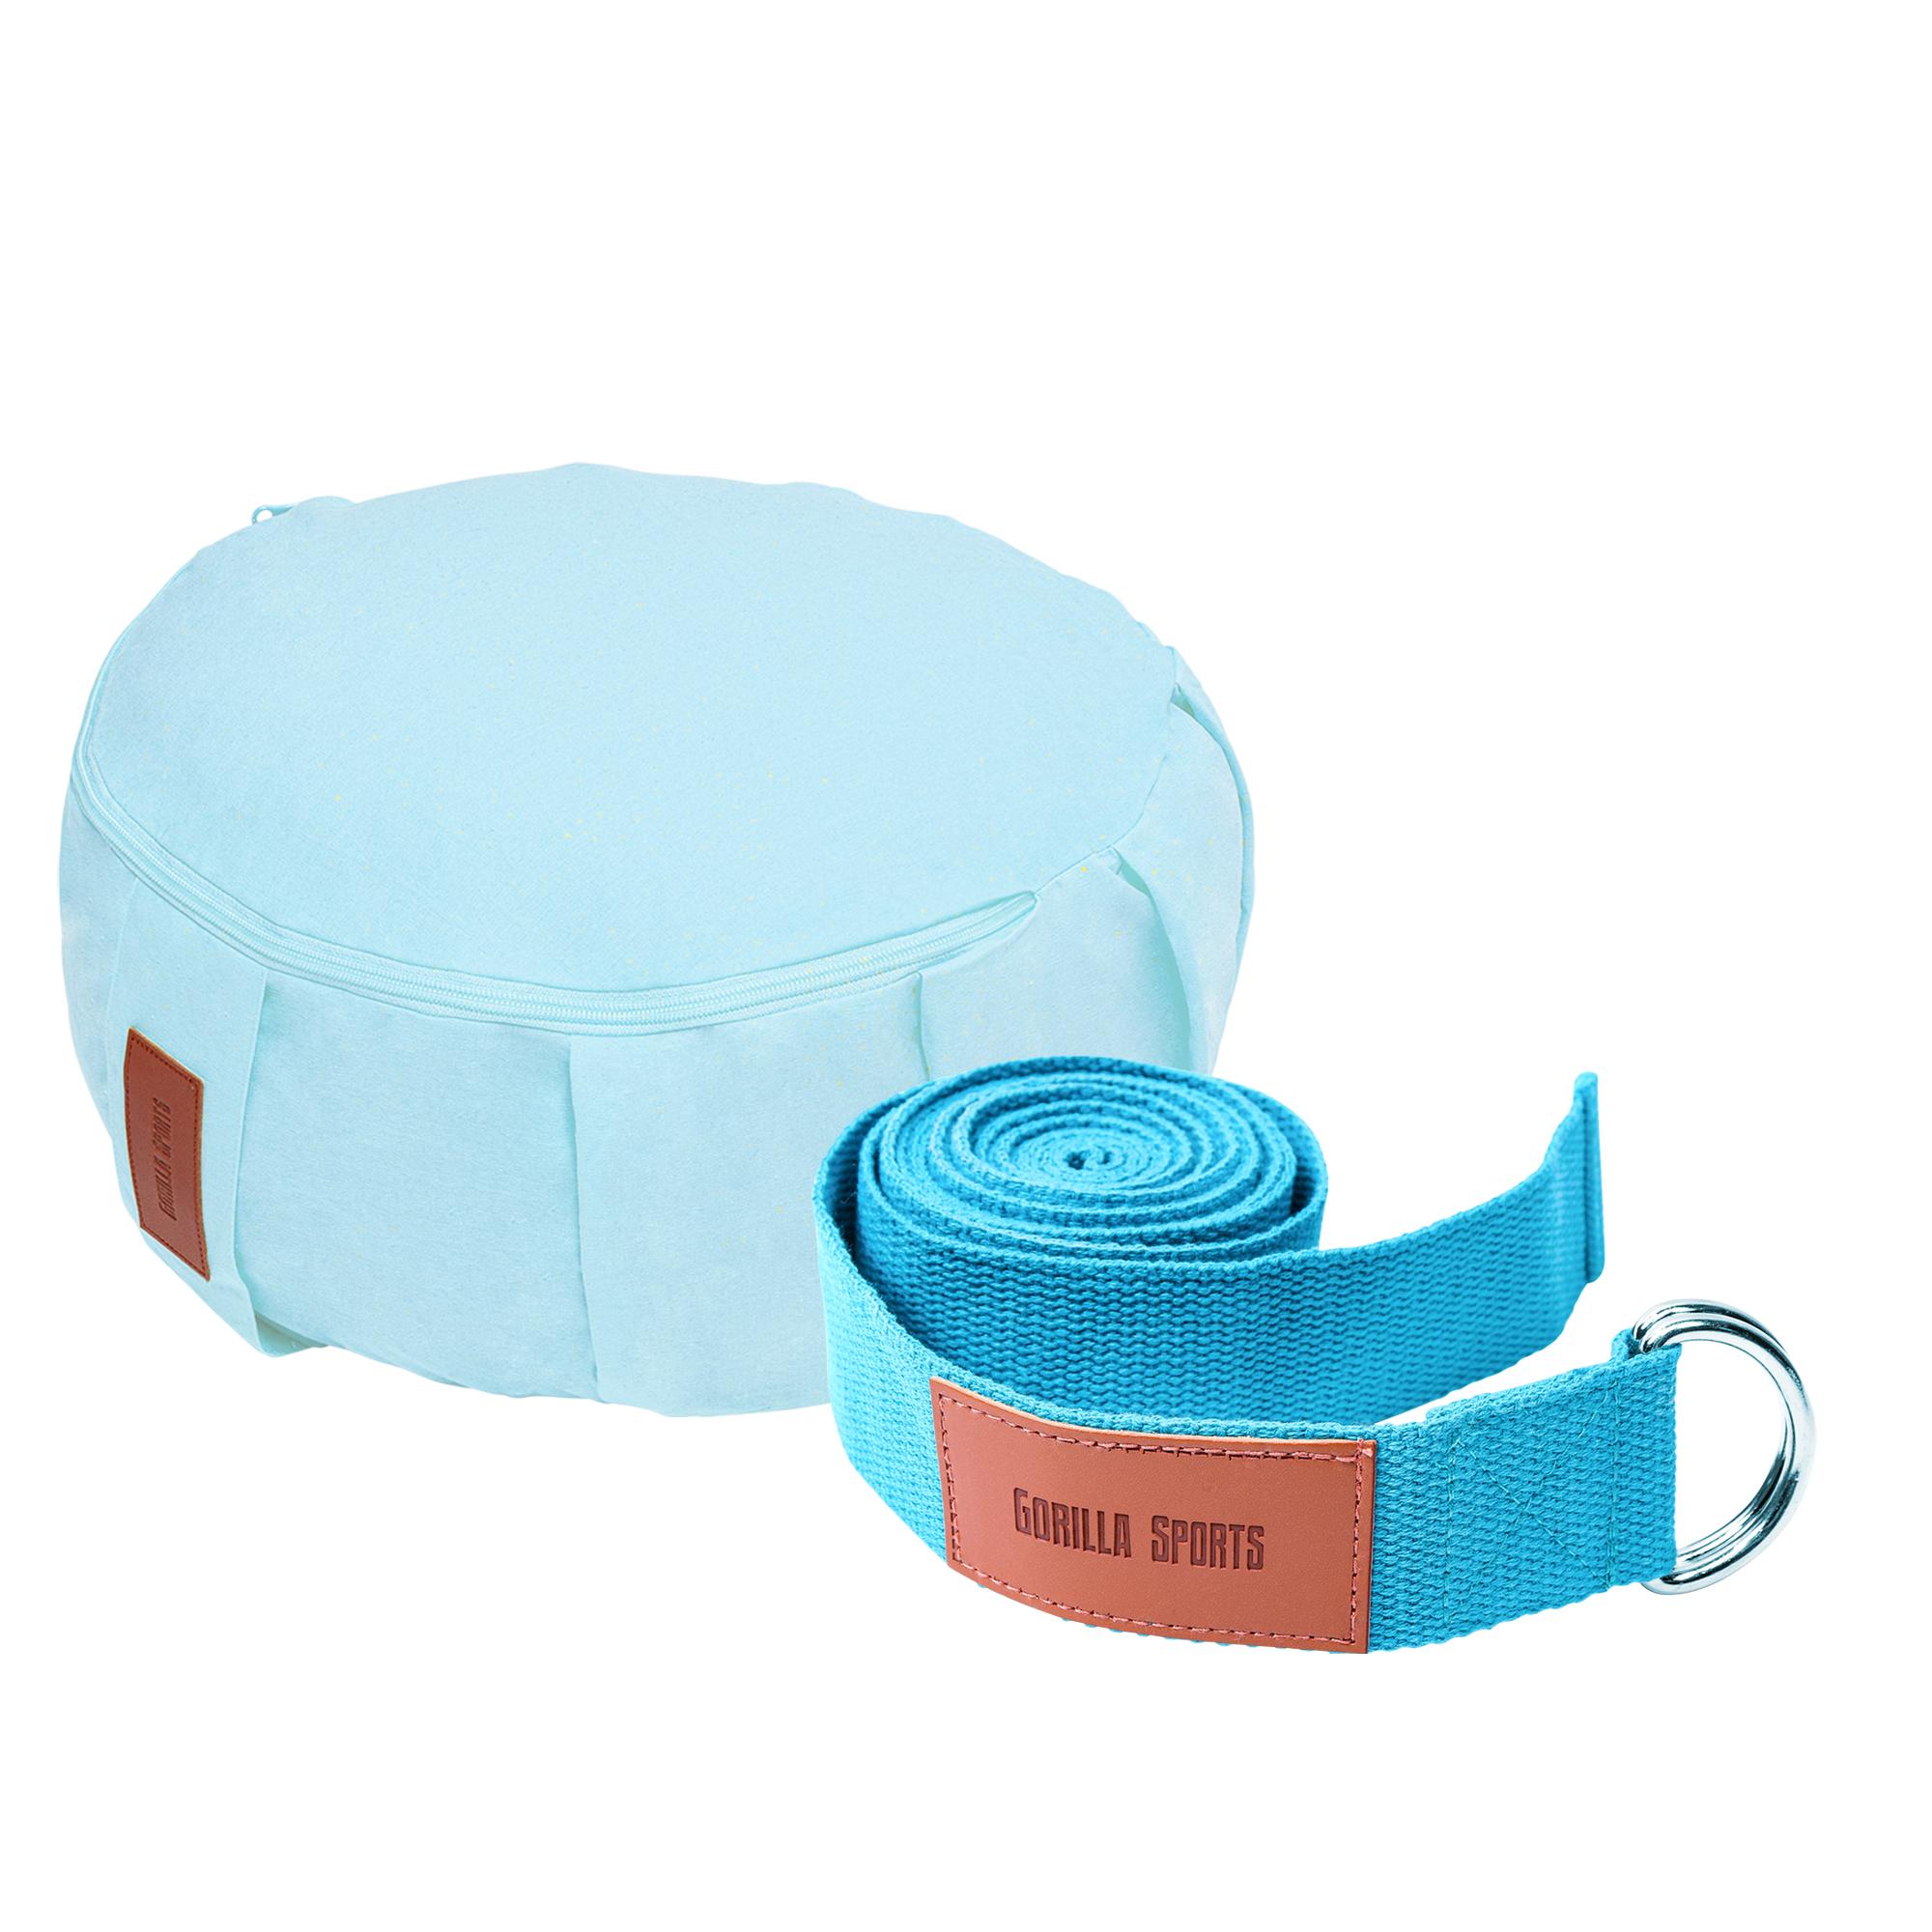 Gorilla Sports Yoga Set Blau/Türkis inkl. Yogakissen und Yogagurt 101133-00030-0001